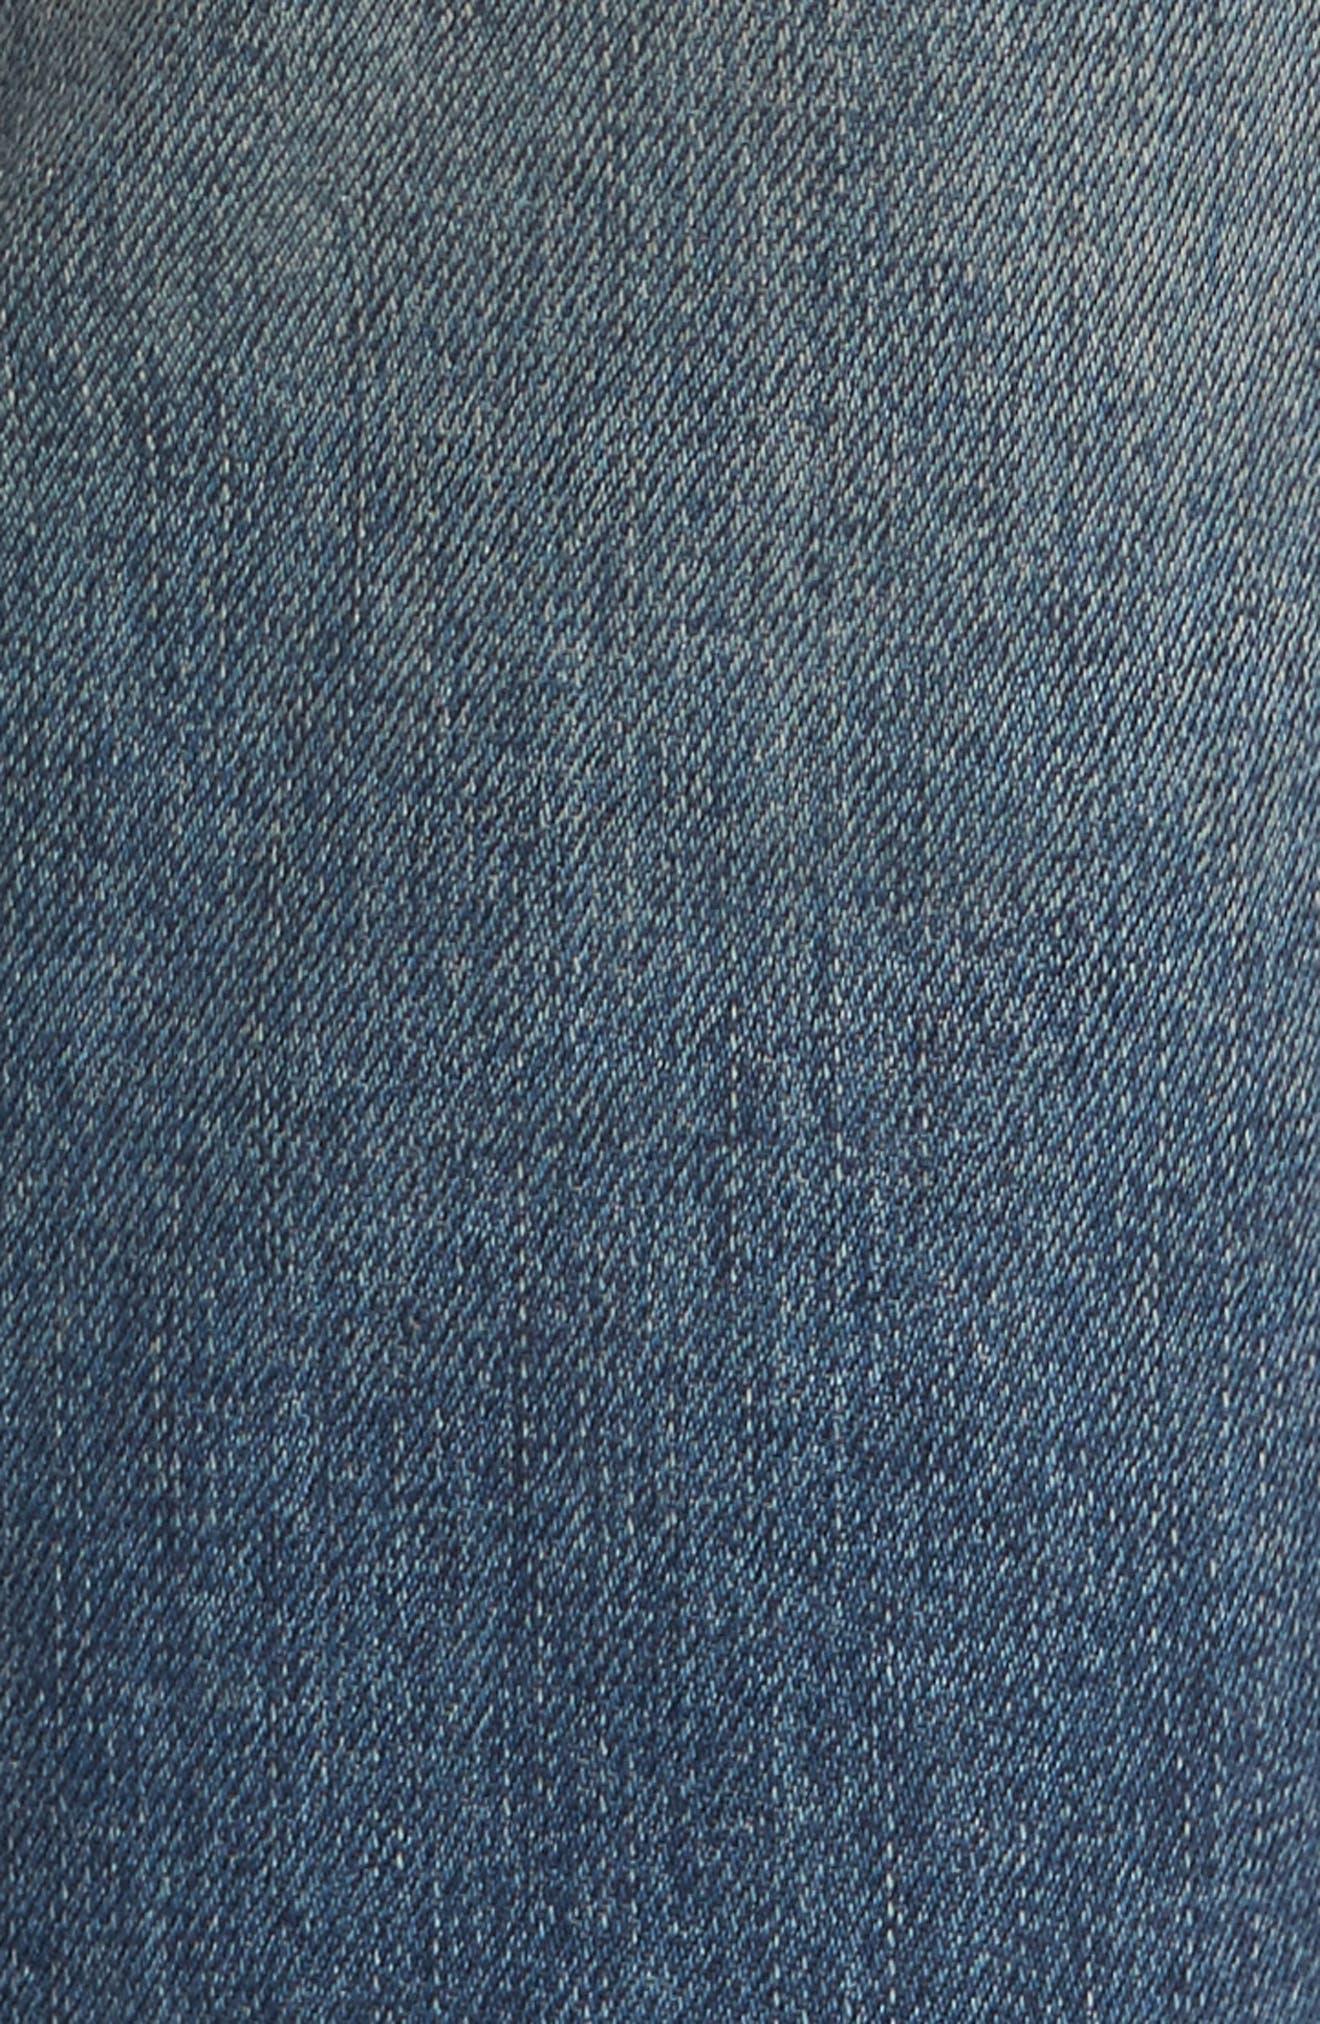 High Waist Skinny Crop Jeans,                             Alternate thumbnail 5, color,                             400